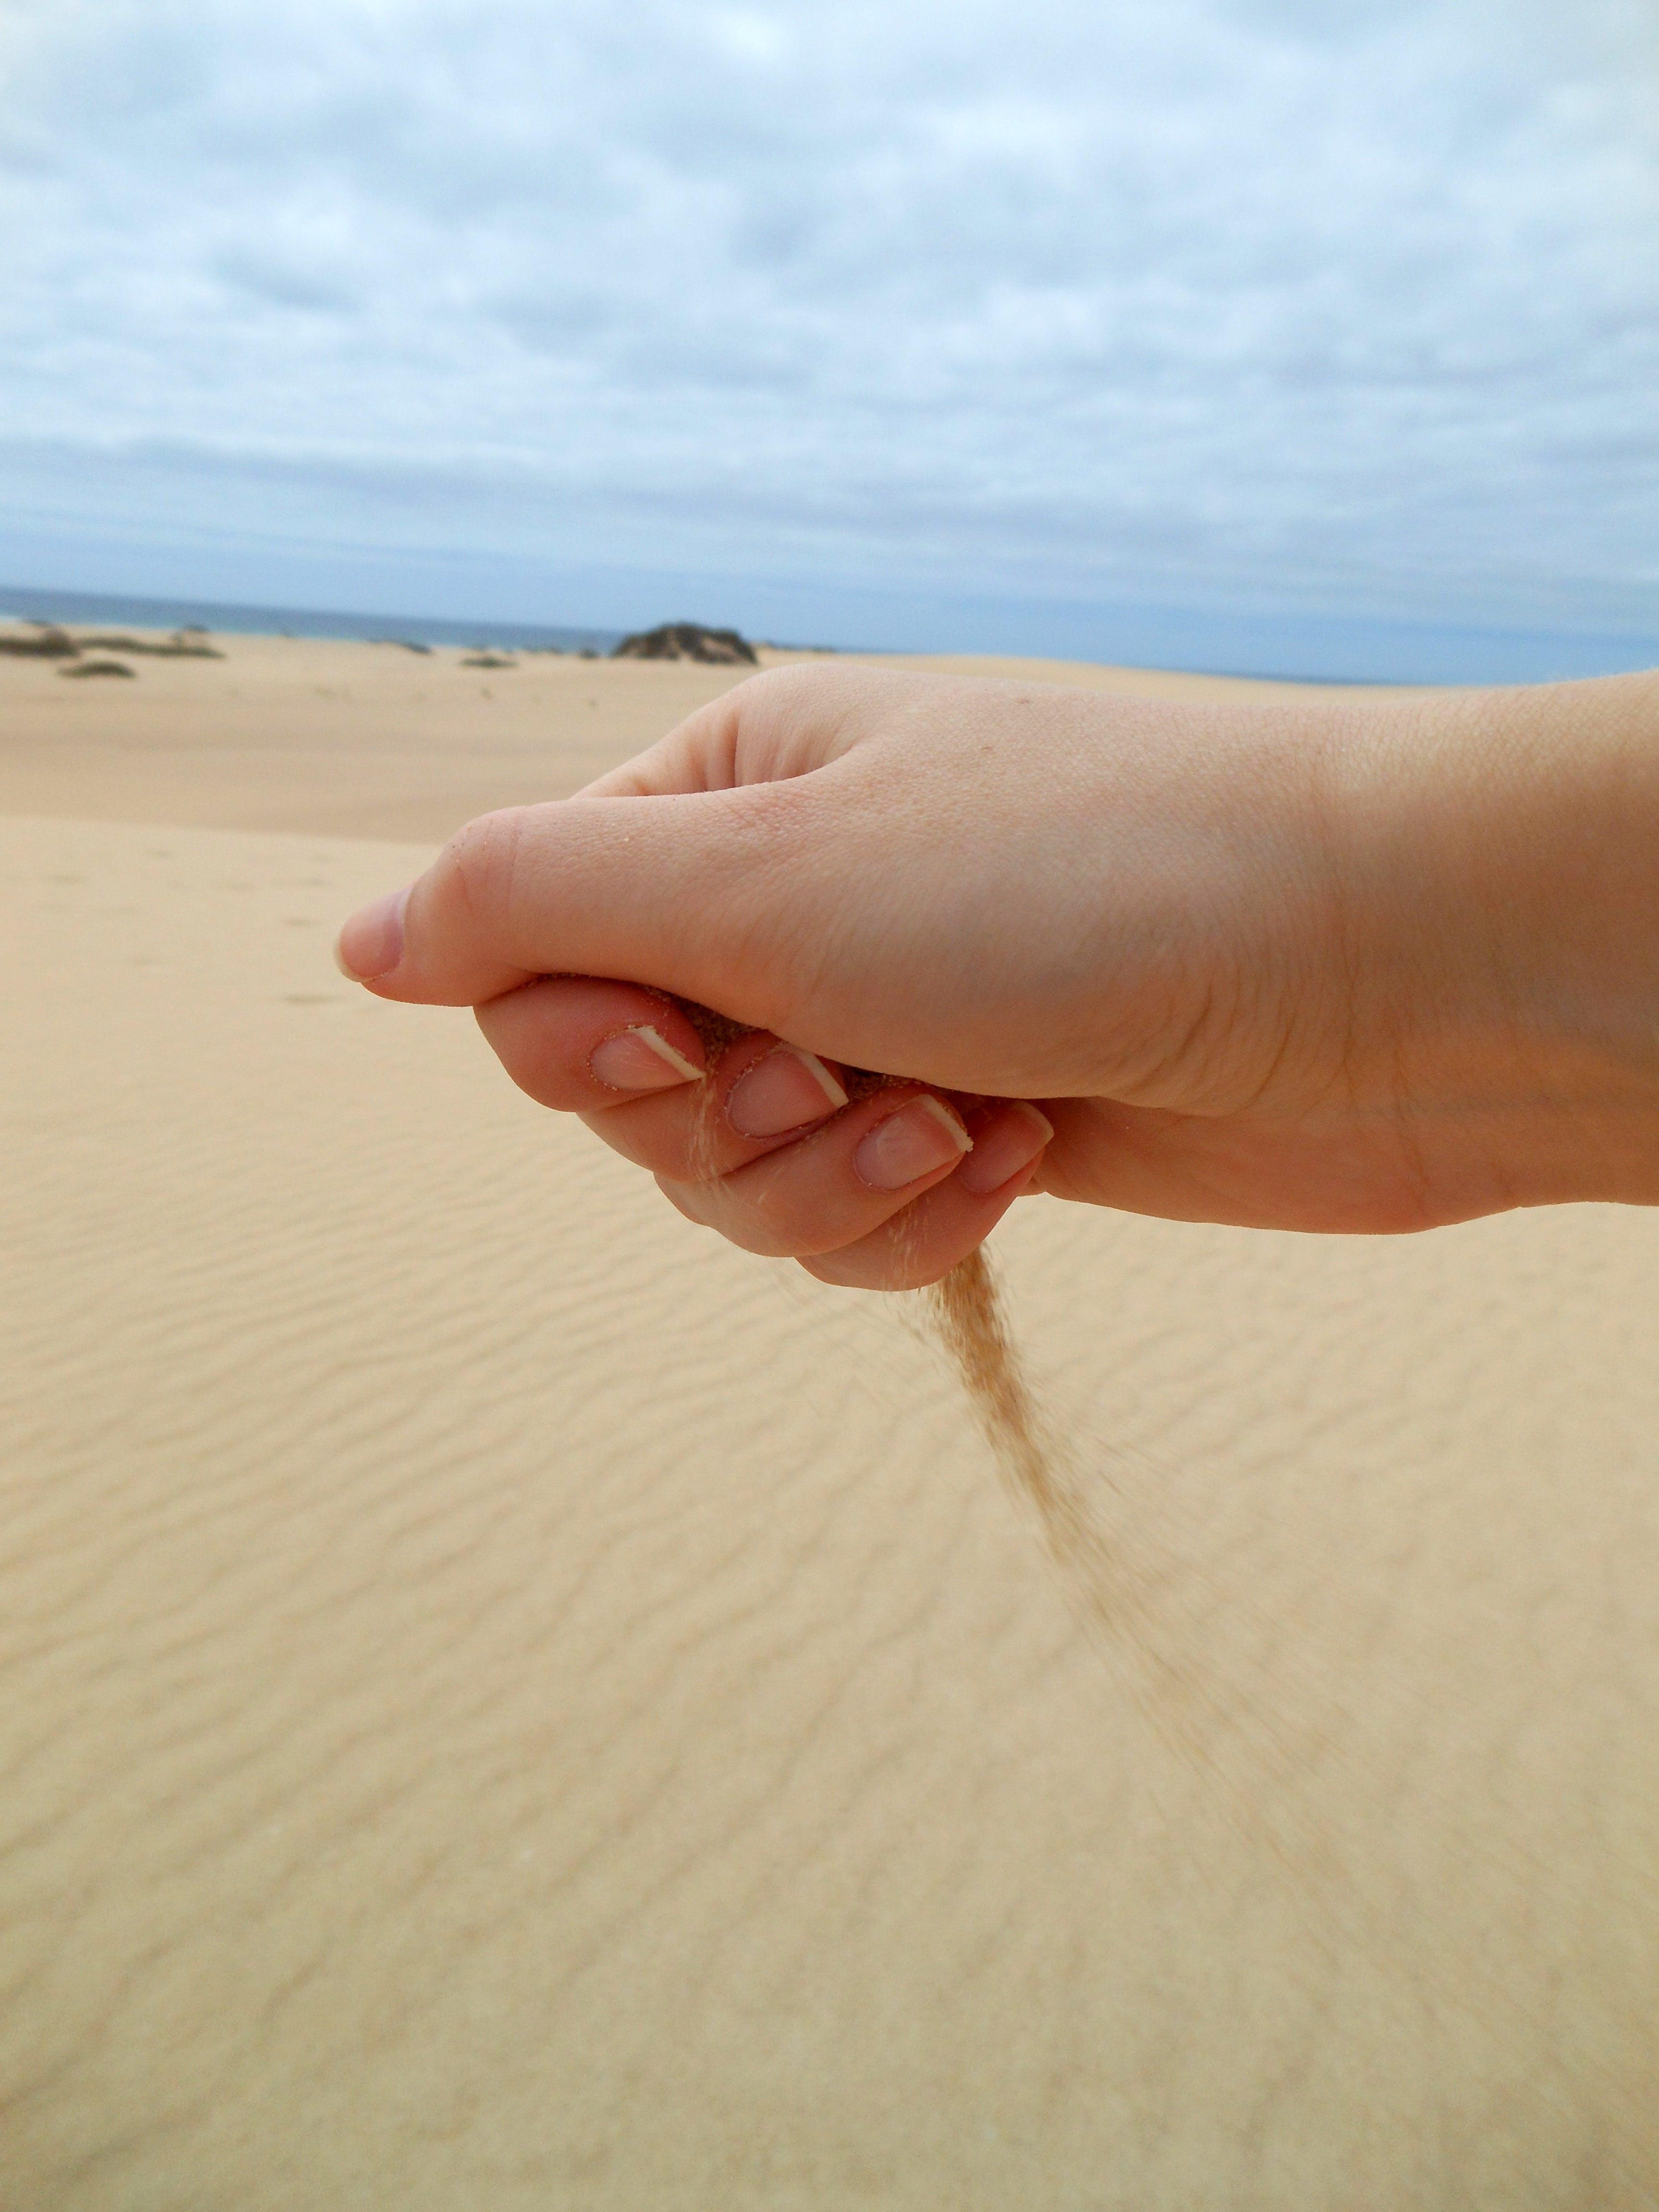 Free stock photo of beach, hand, hand with sand, sand